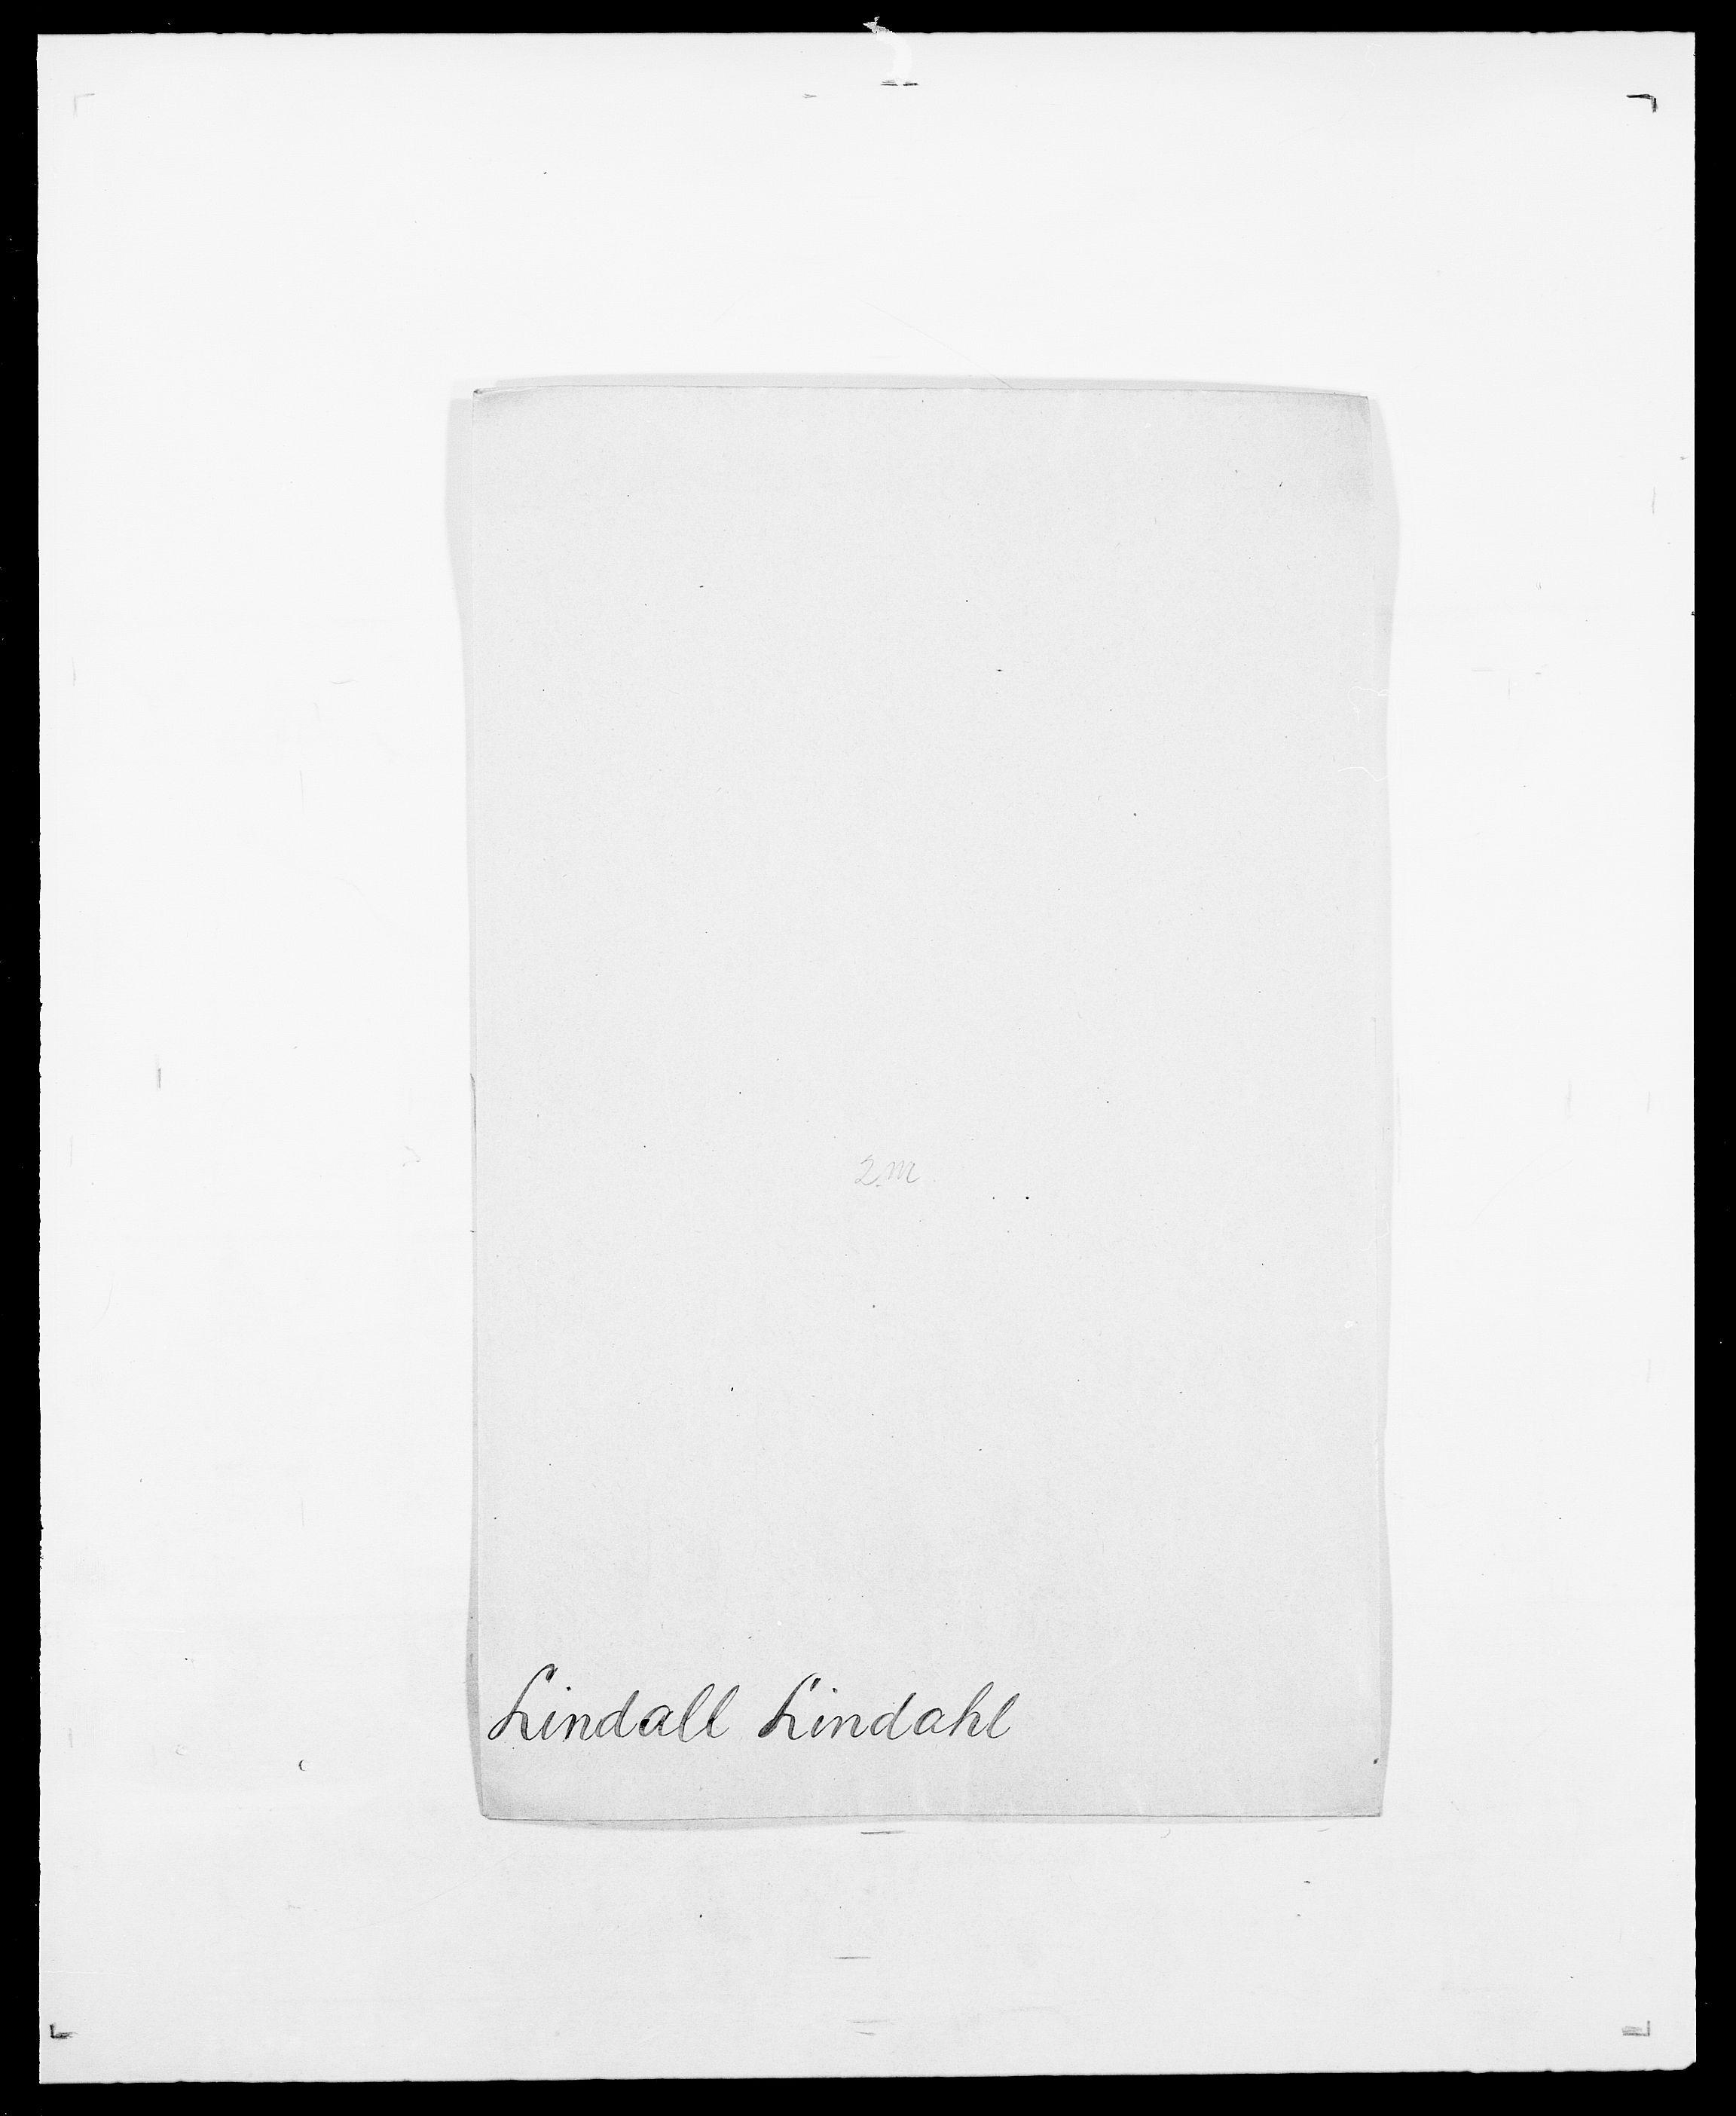 SAO, Delgobe, Charles Antoine - samling, D/Da/L0023: Lau - Lirvyn, s. 553